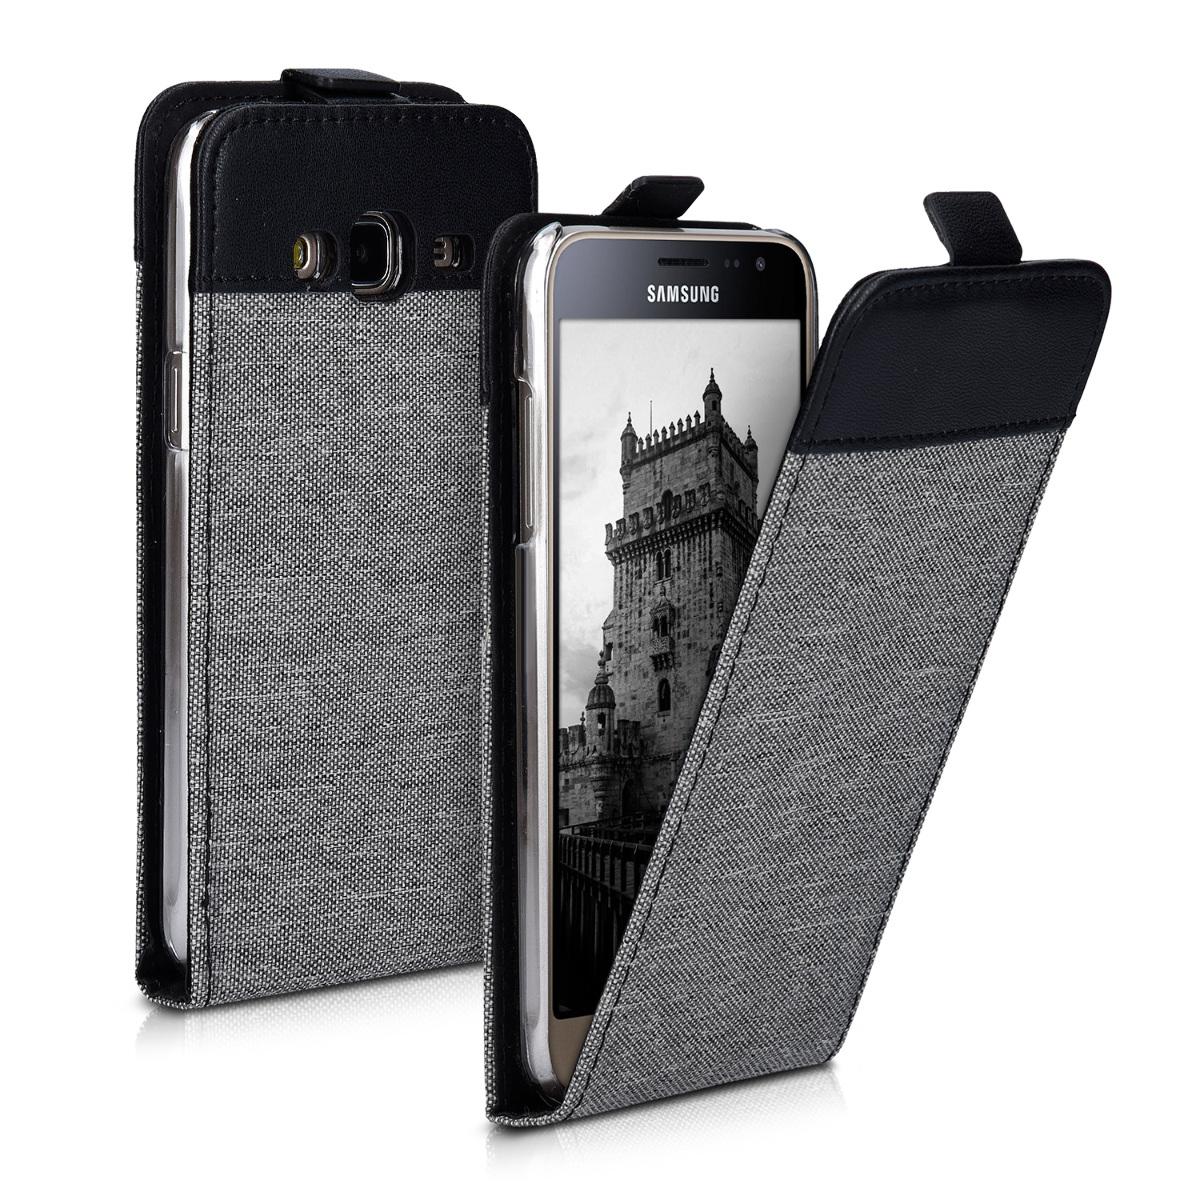 KW Flip Θήκη Samsung Galaxy J3 (2016) DUOS - Grey / Black (39424.22)